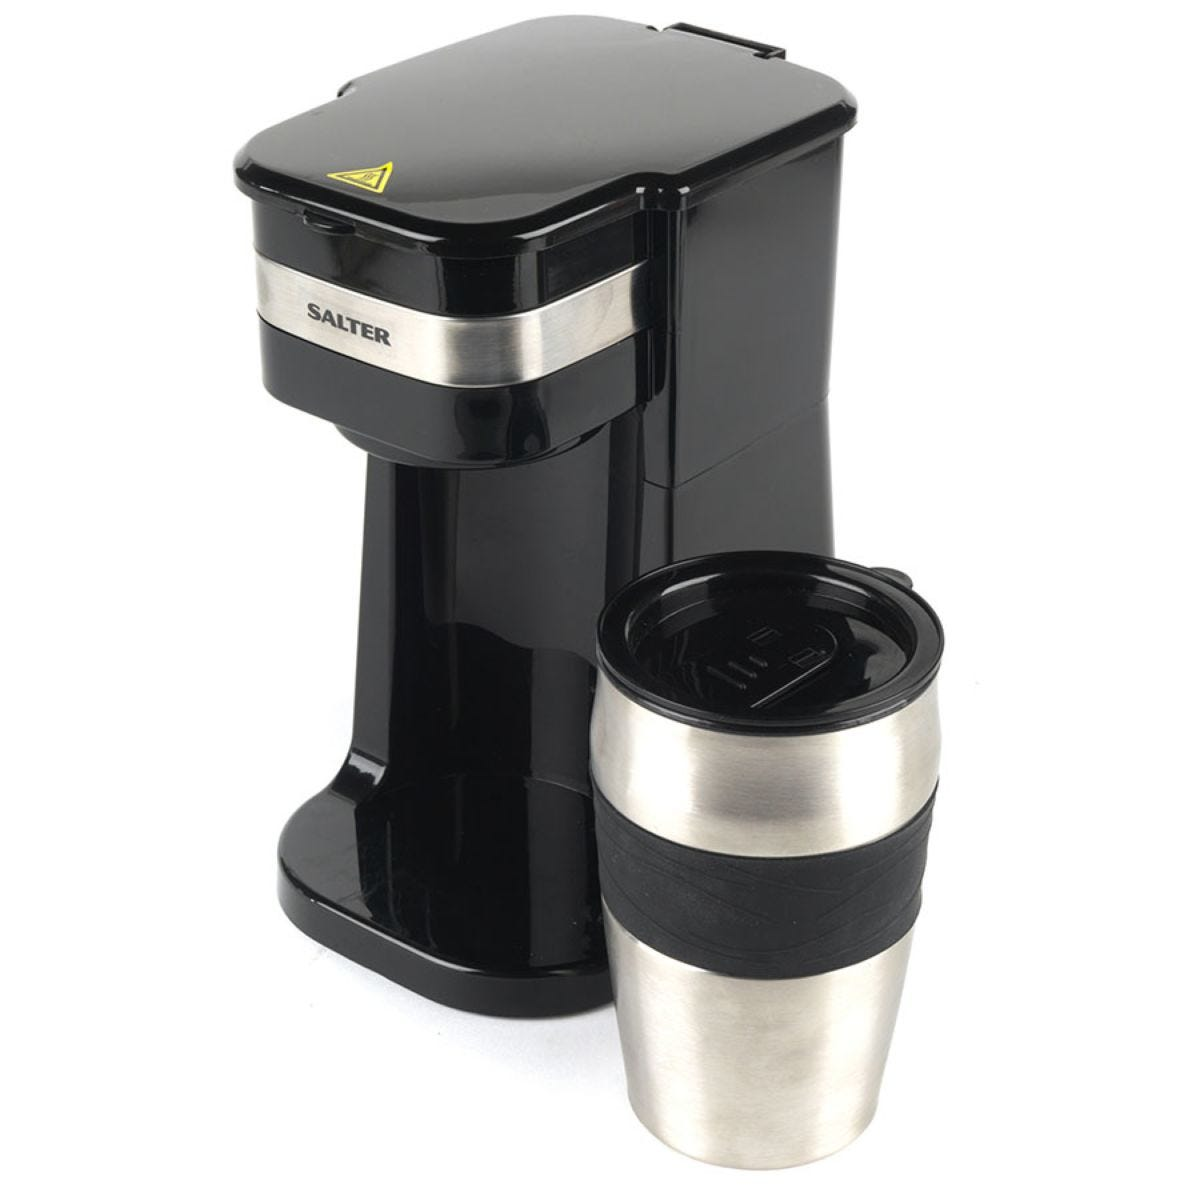 Salter EK2408 Coffee Maker to Go Personal Filter Coffee Machine with Travel Mug